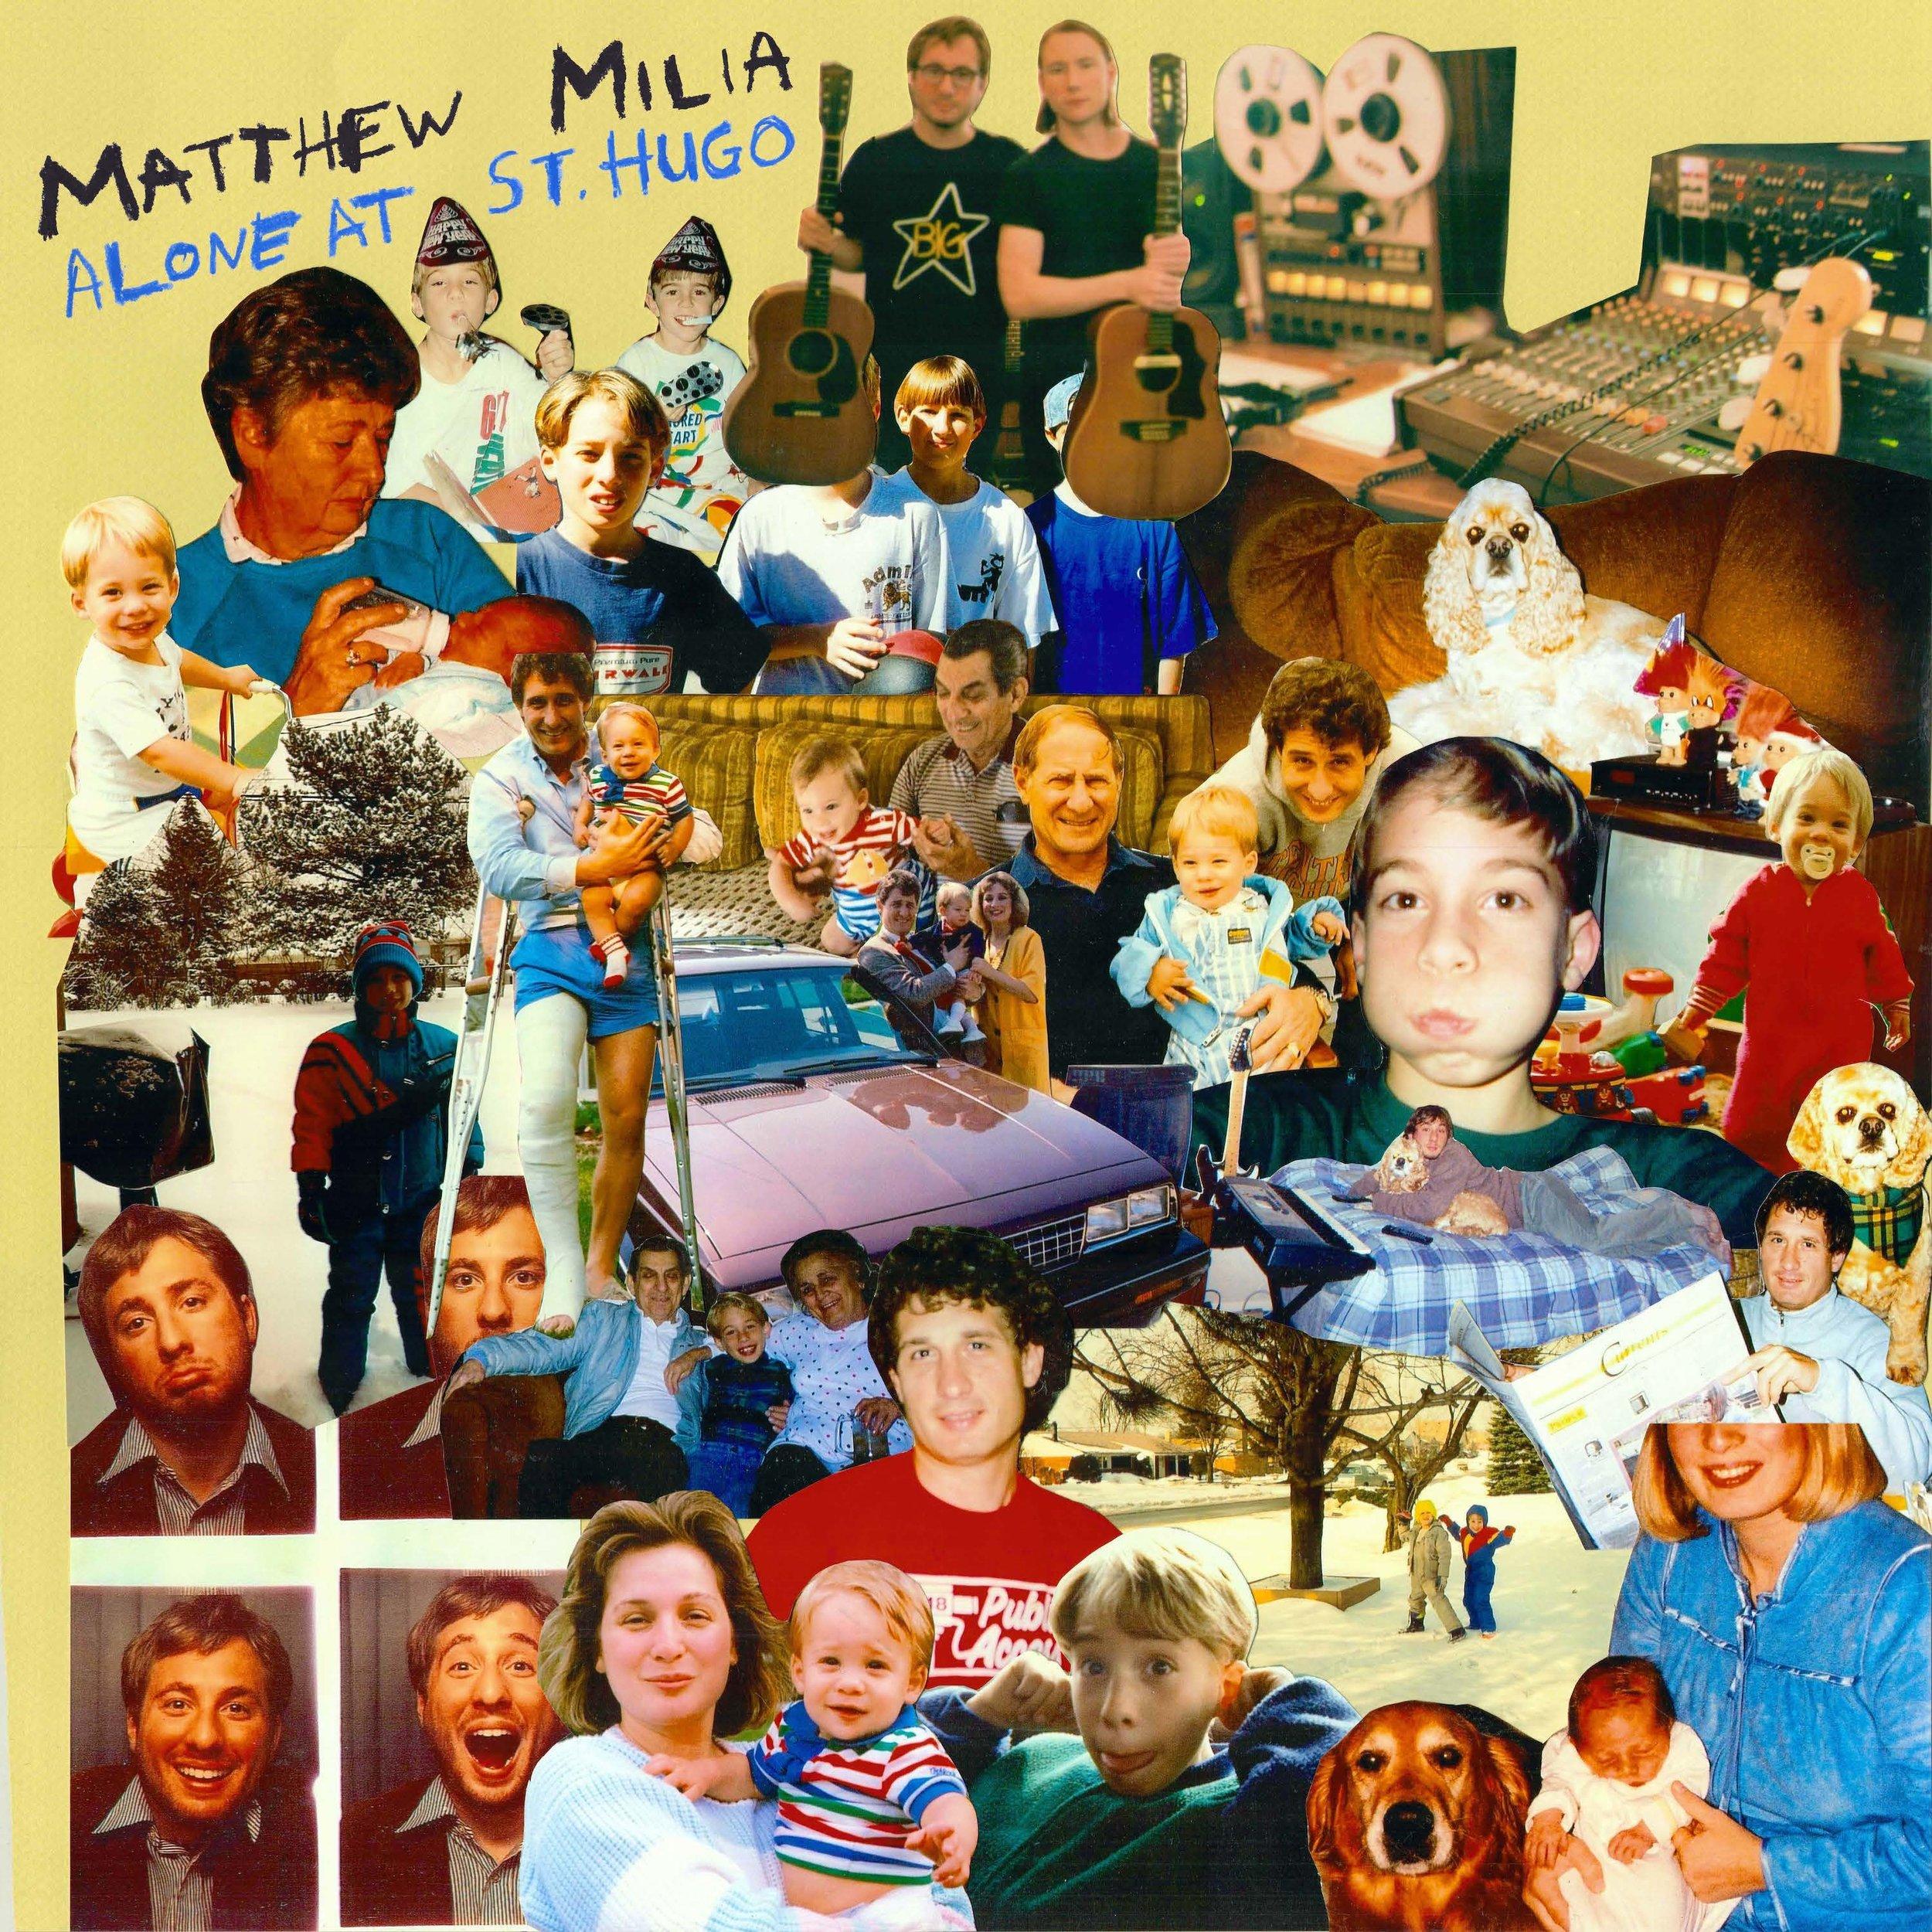 Matthew Milia - Alone at St. Hugo (cover).jpg